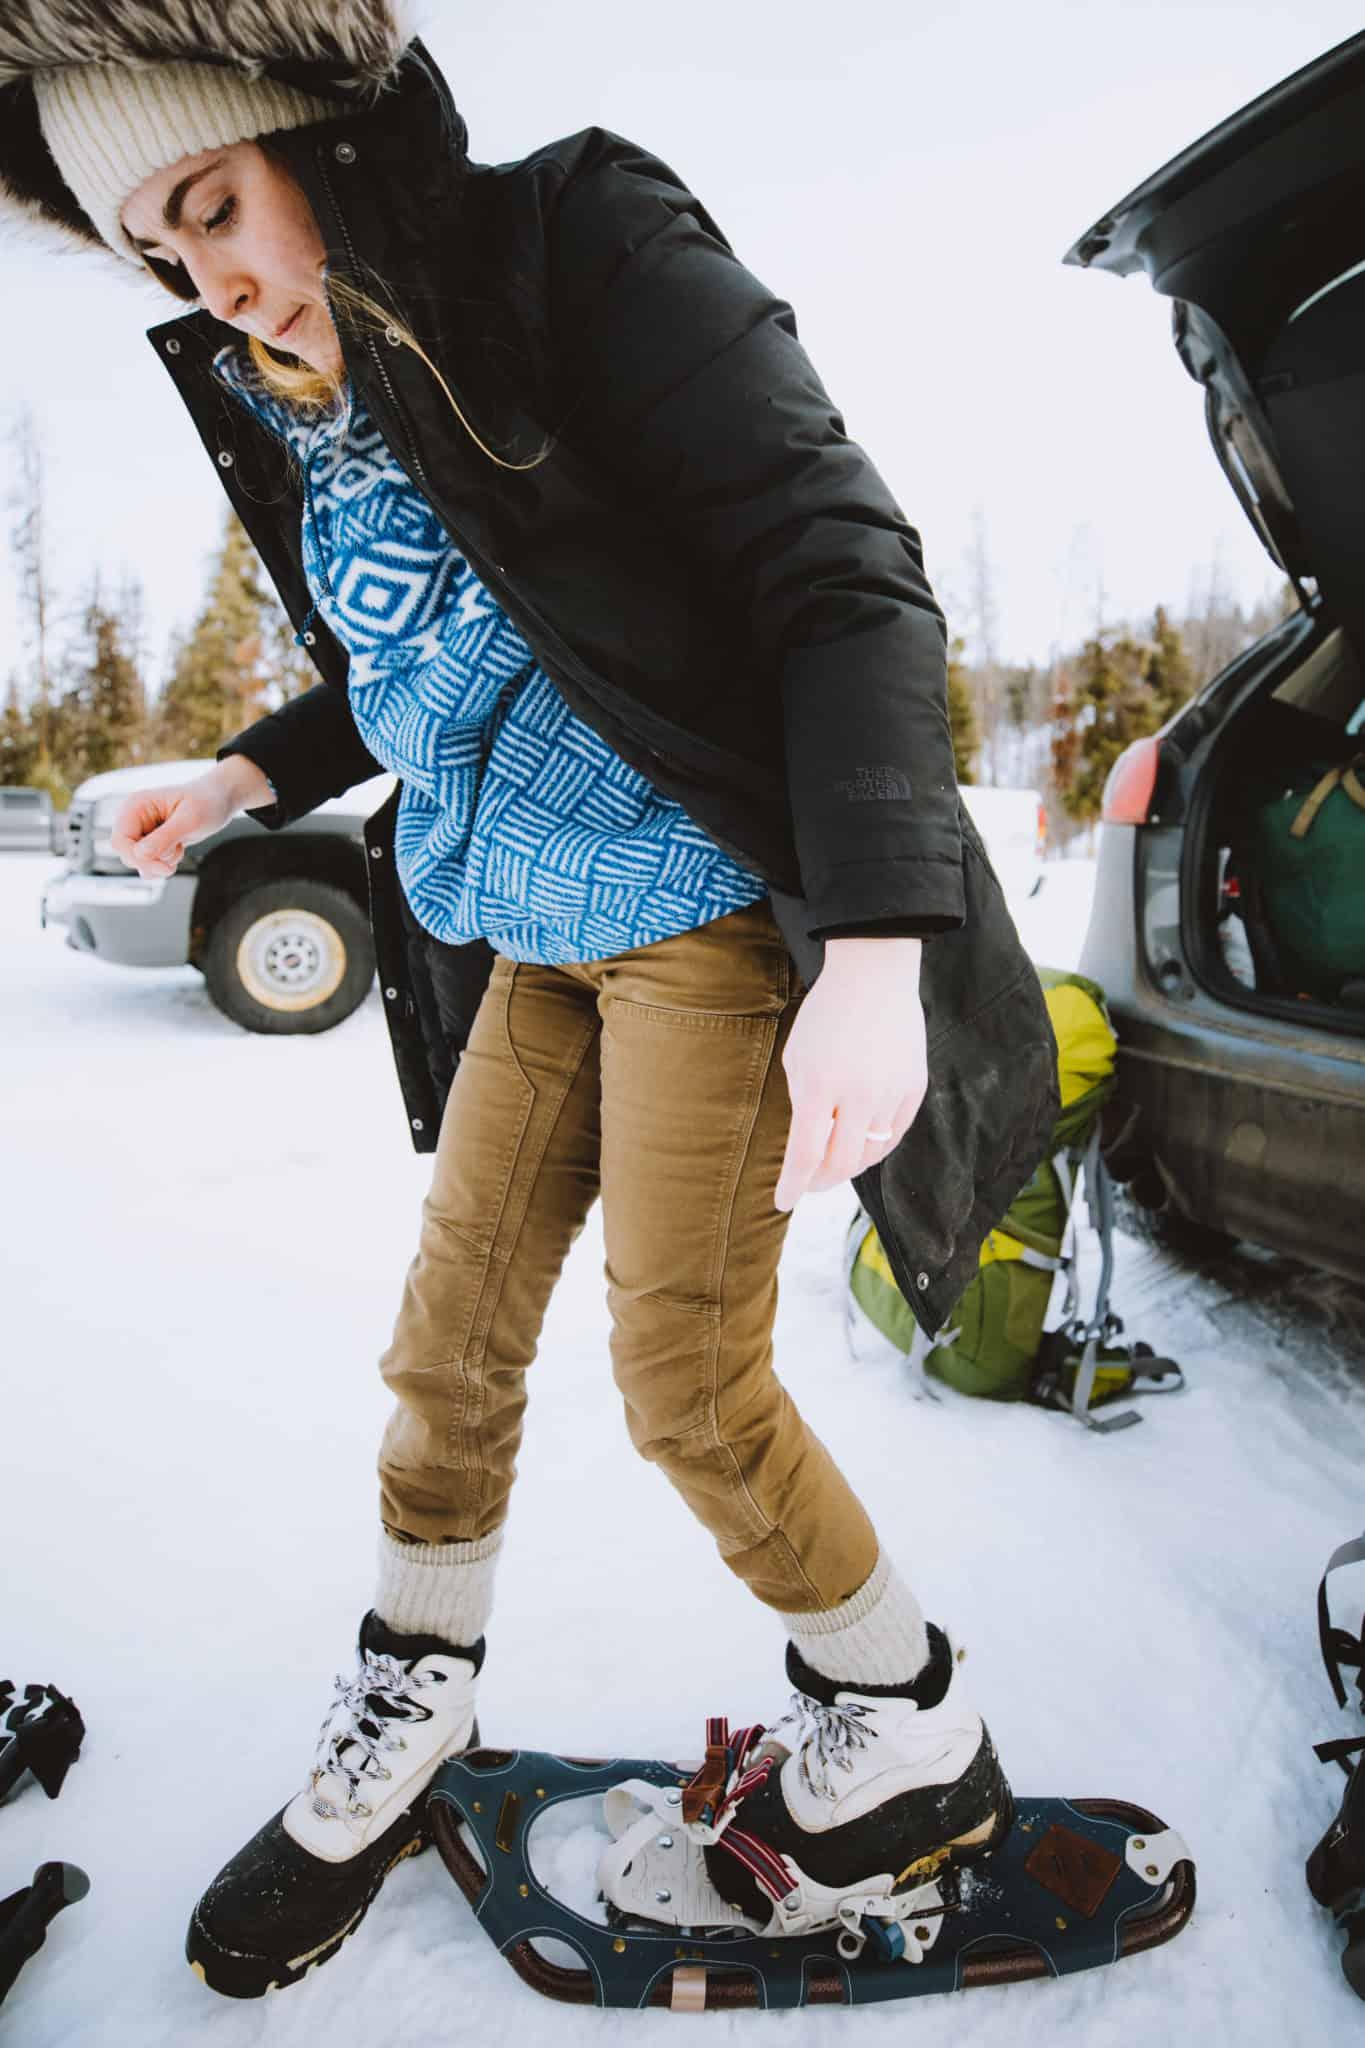 Emily Mandagie putting on snow shoes